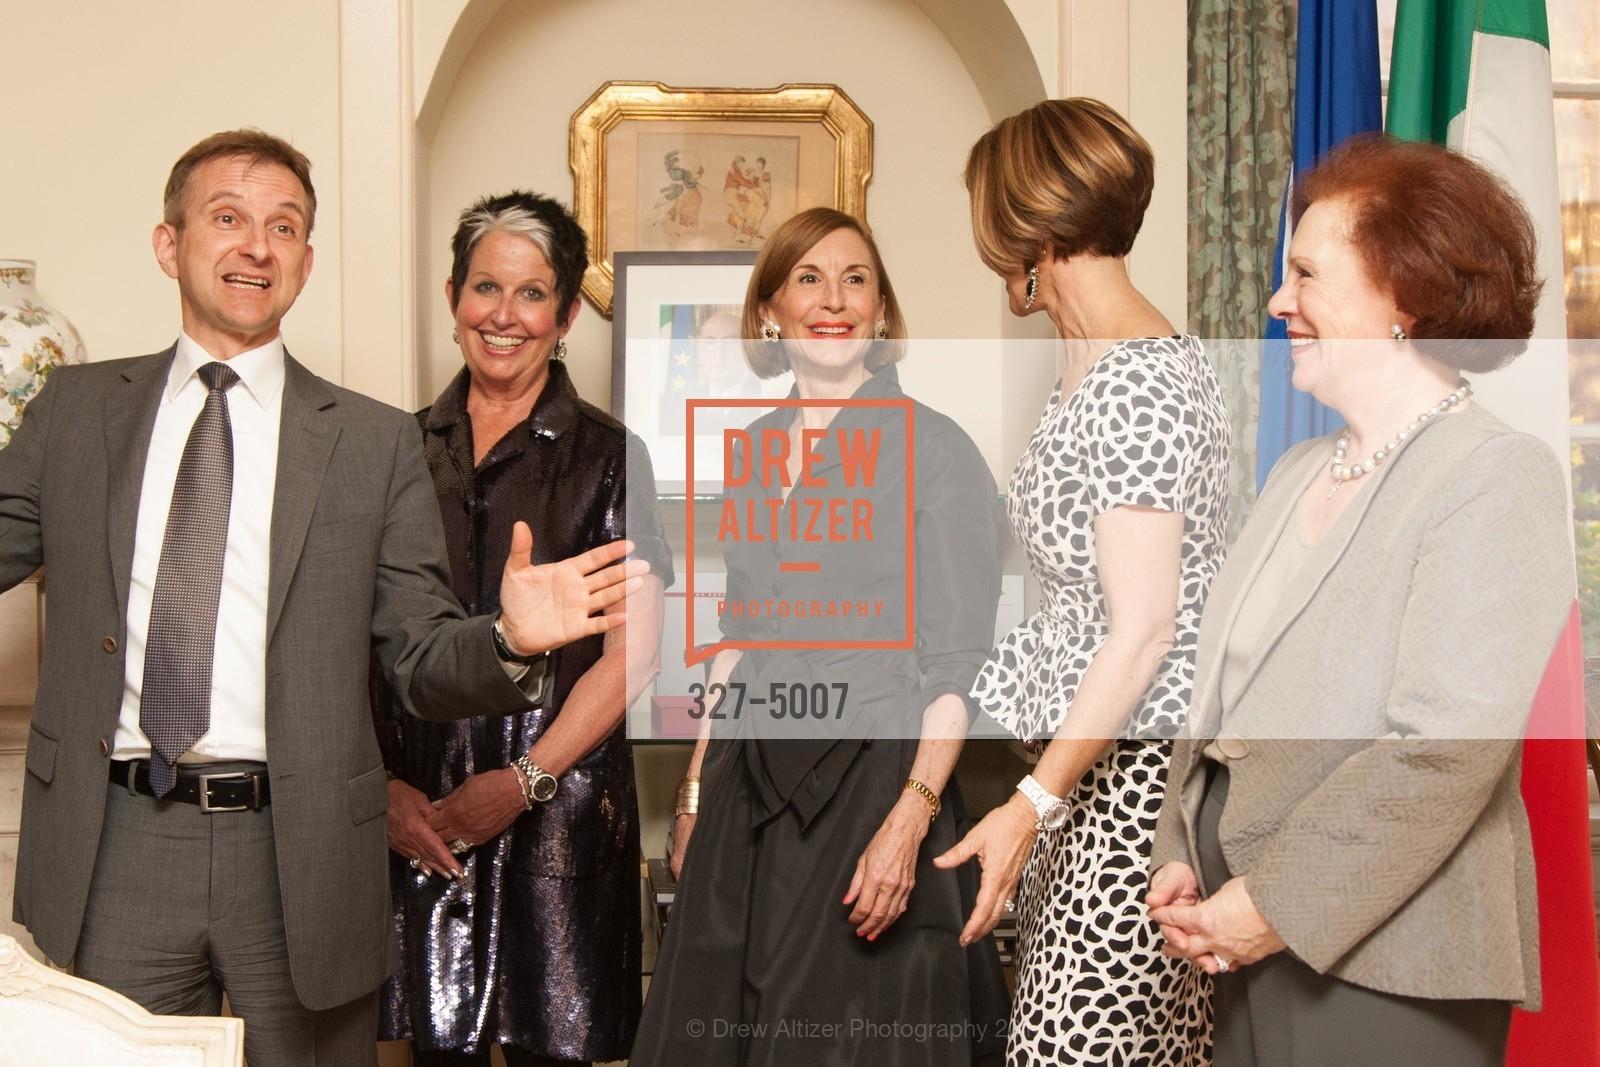 Mauro Battocchi, Karen Kubin, Marsha Monro, Katie Jarman, Romana Bracco, Photo #327-5007